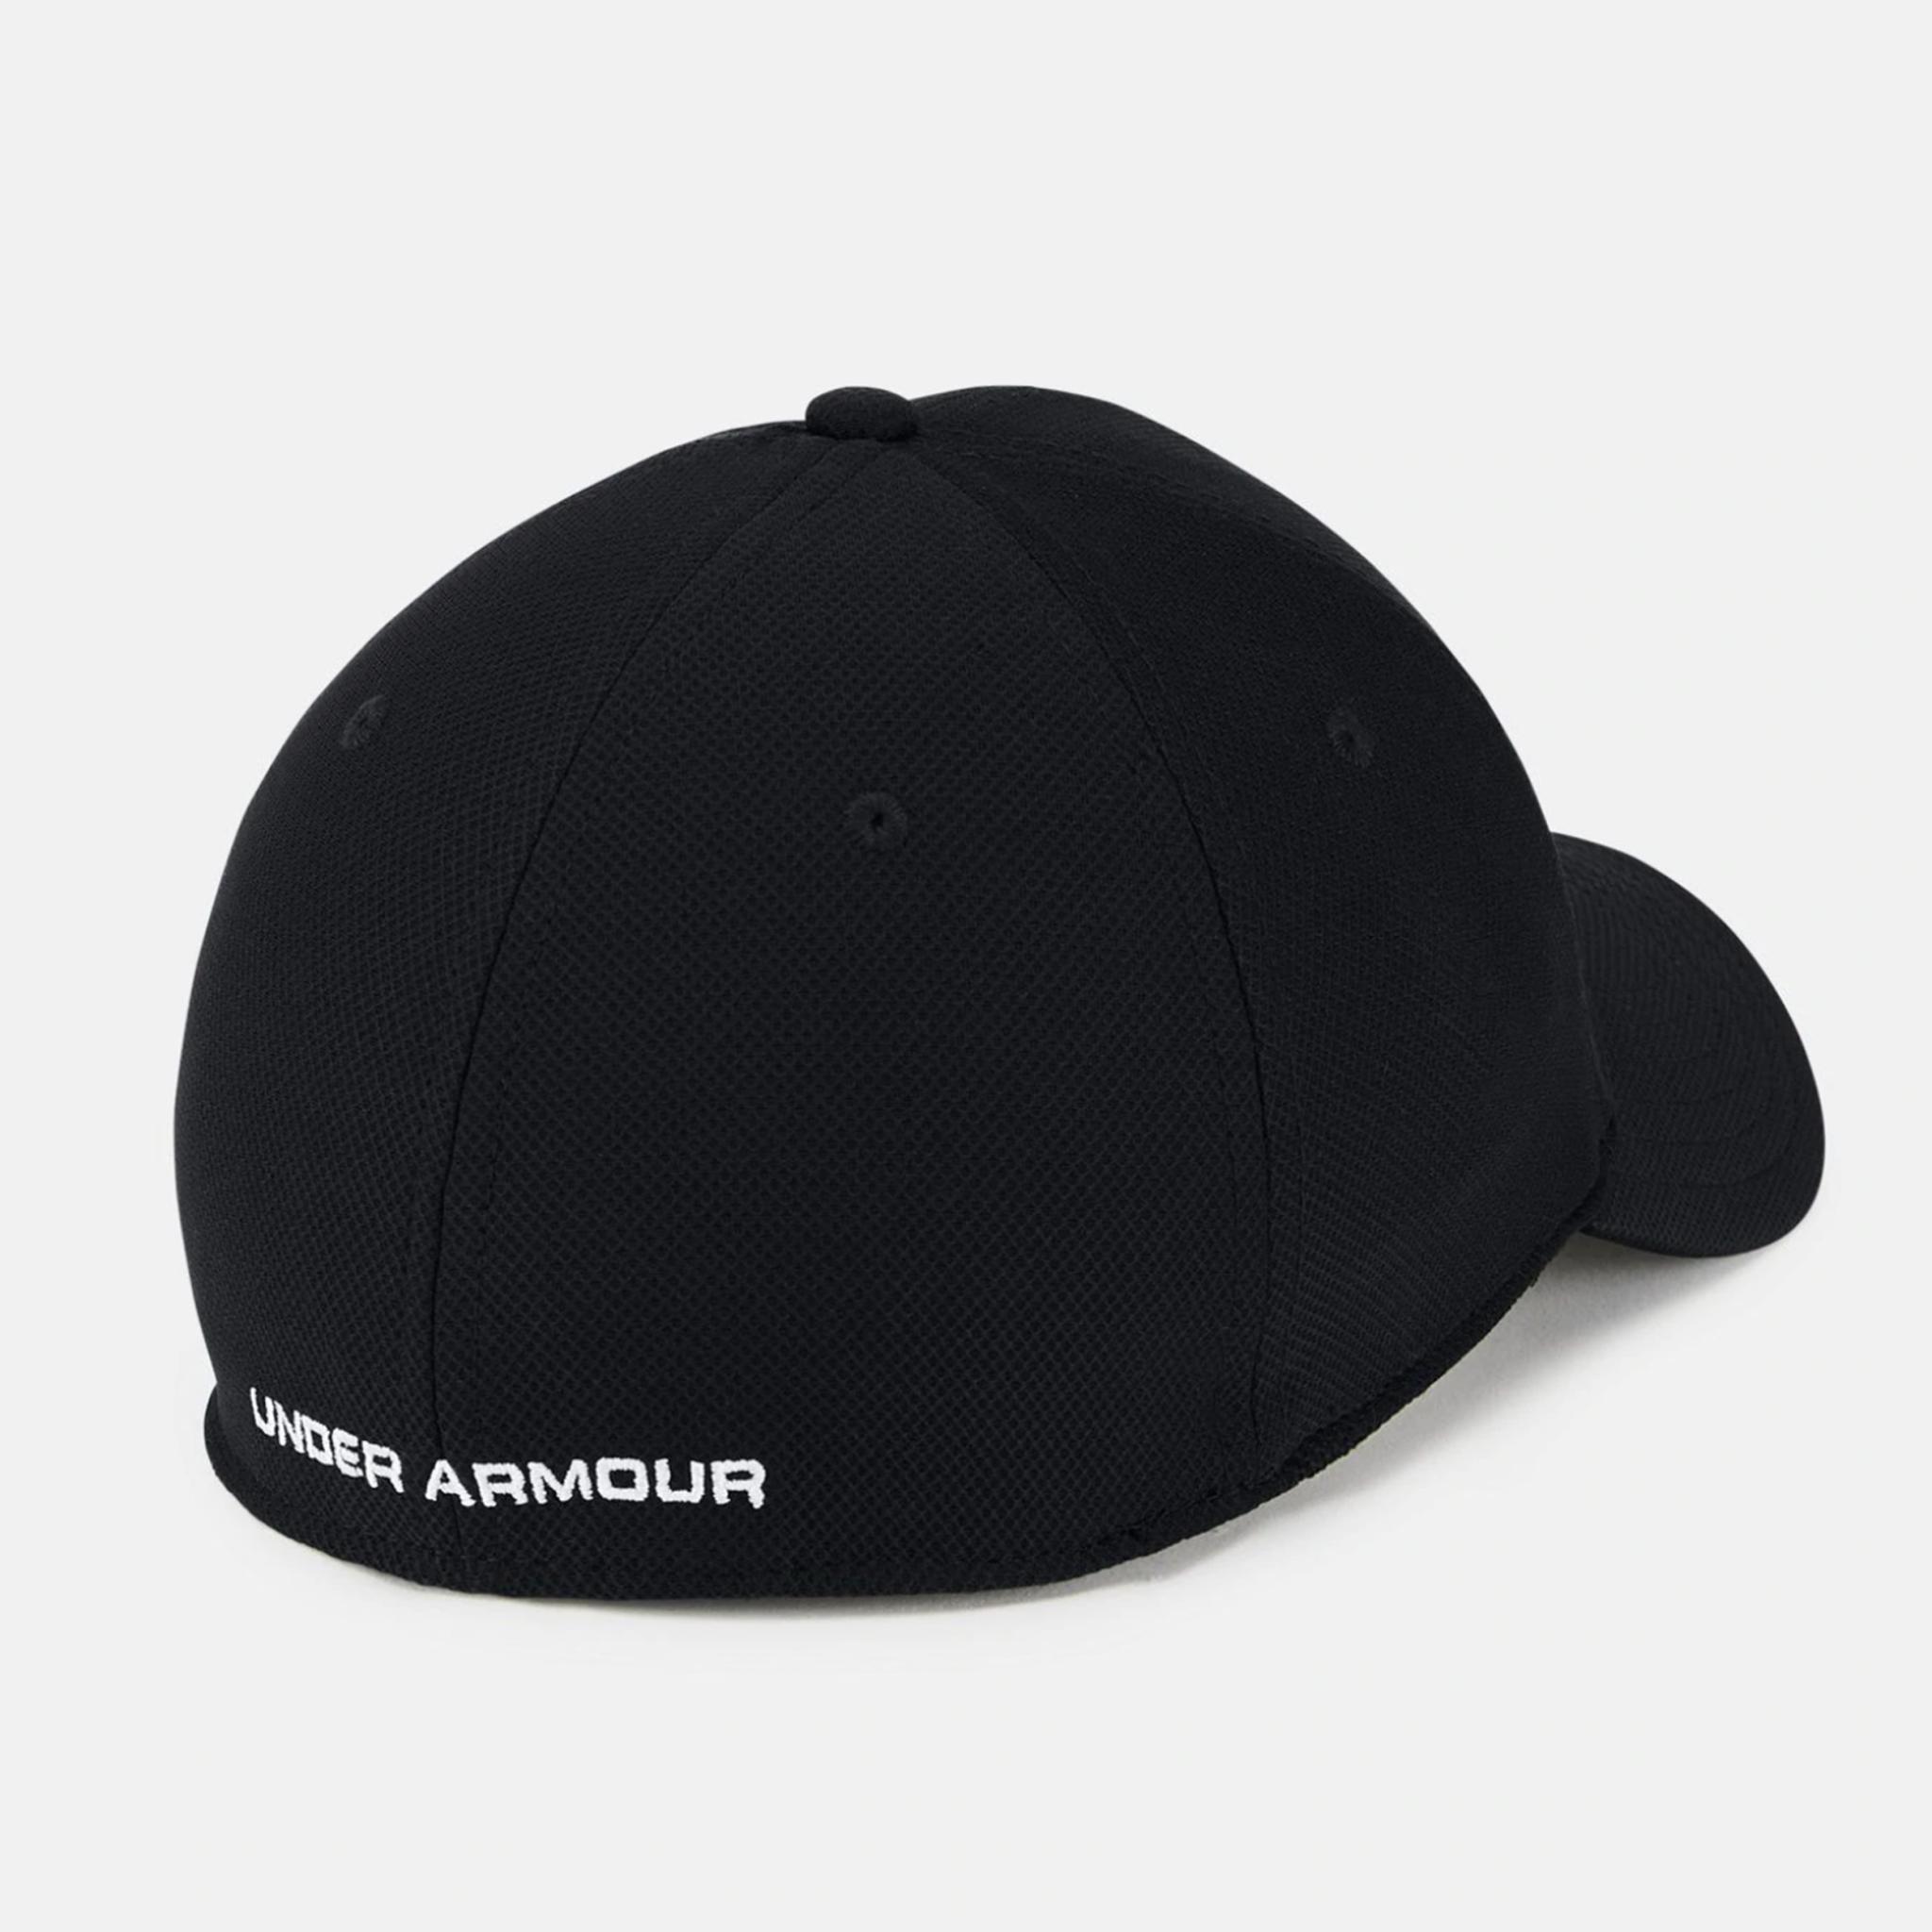 Under Armour Under Armour Mens 3.0 Blitzing Cap White on Black